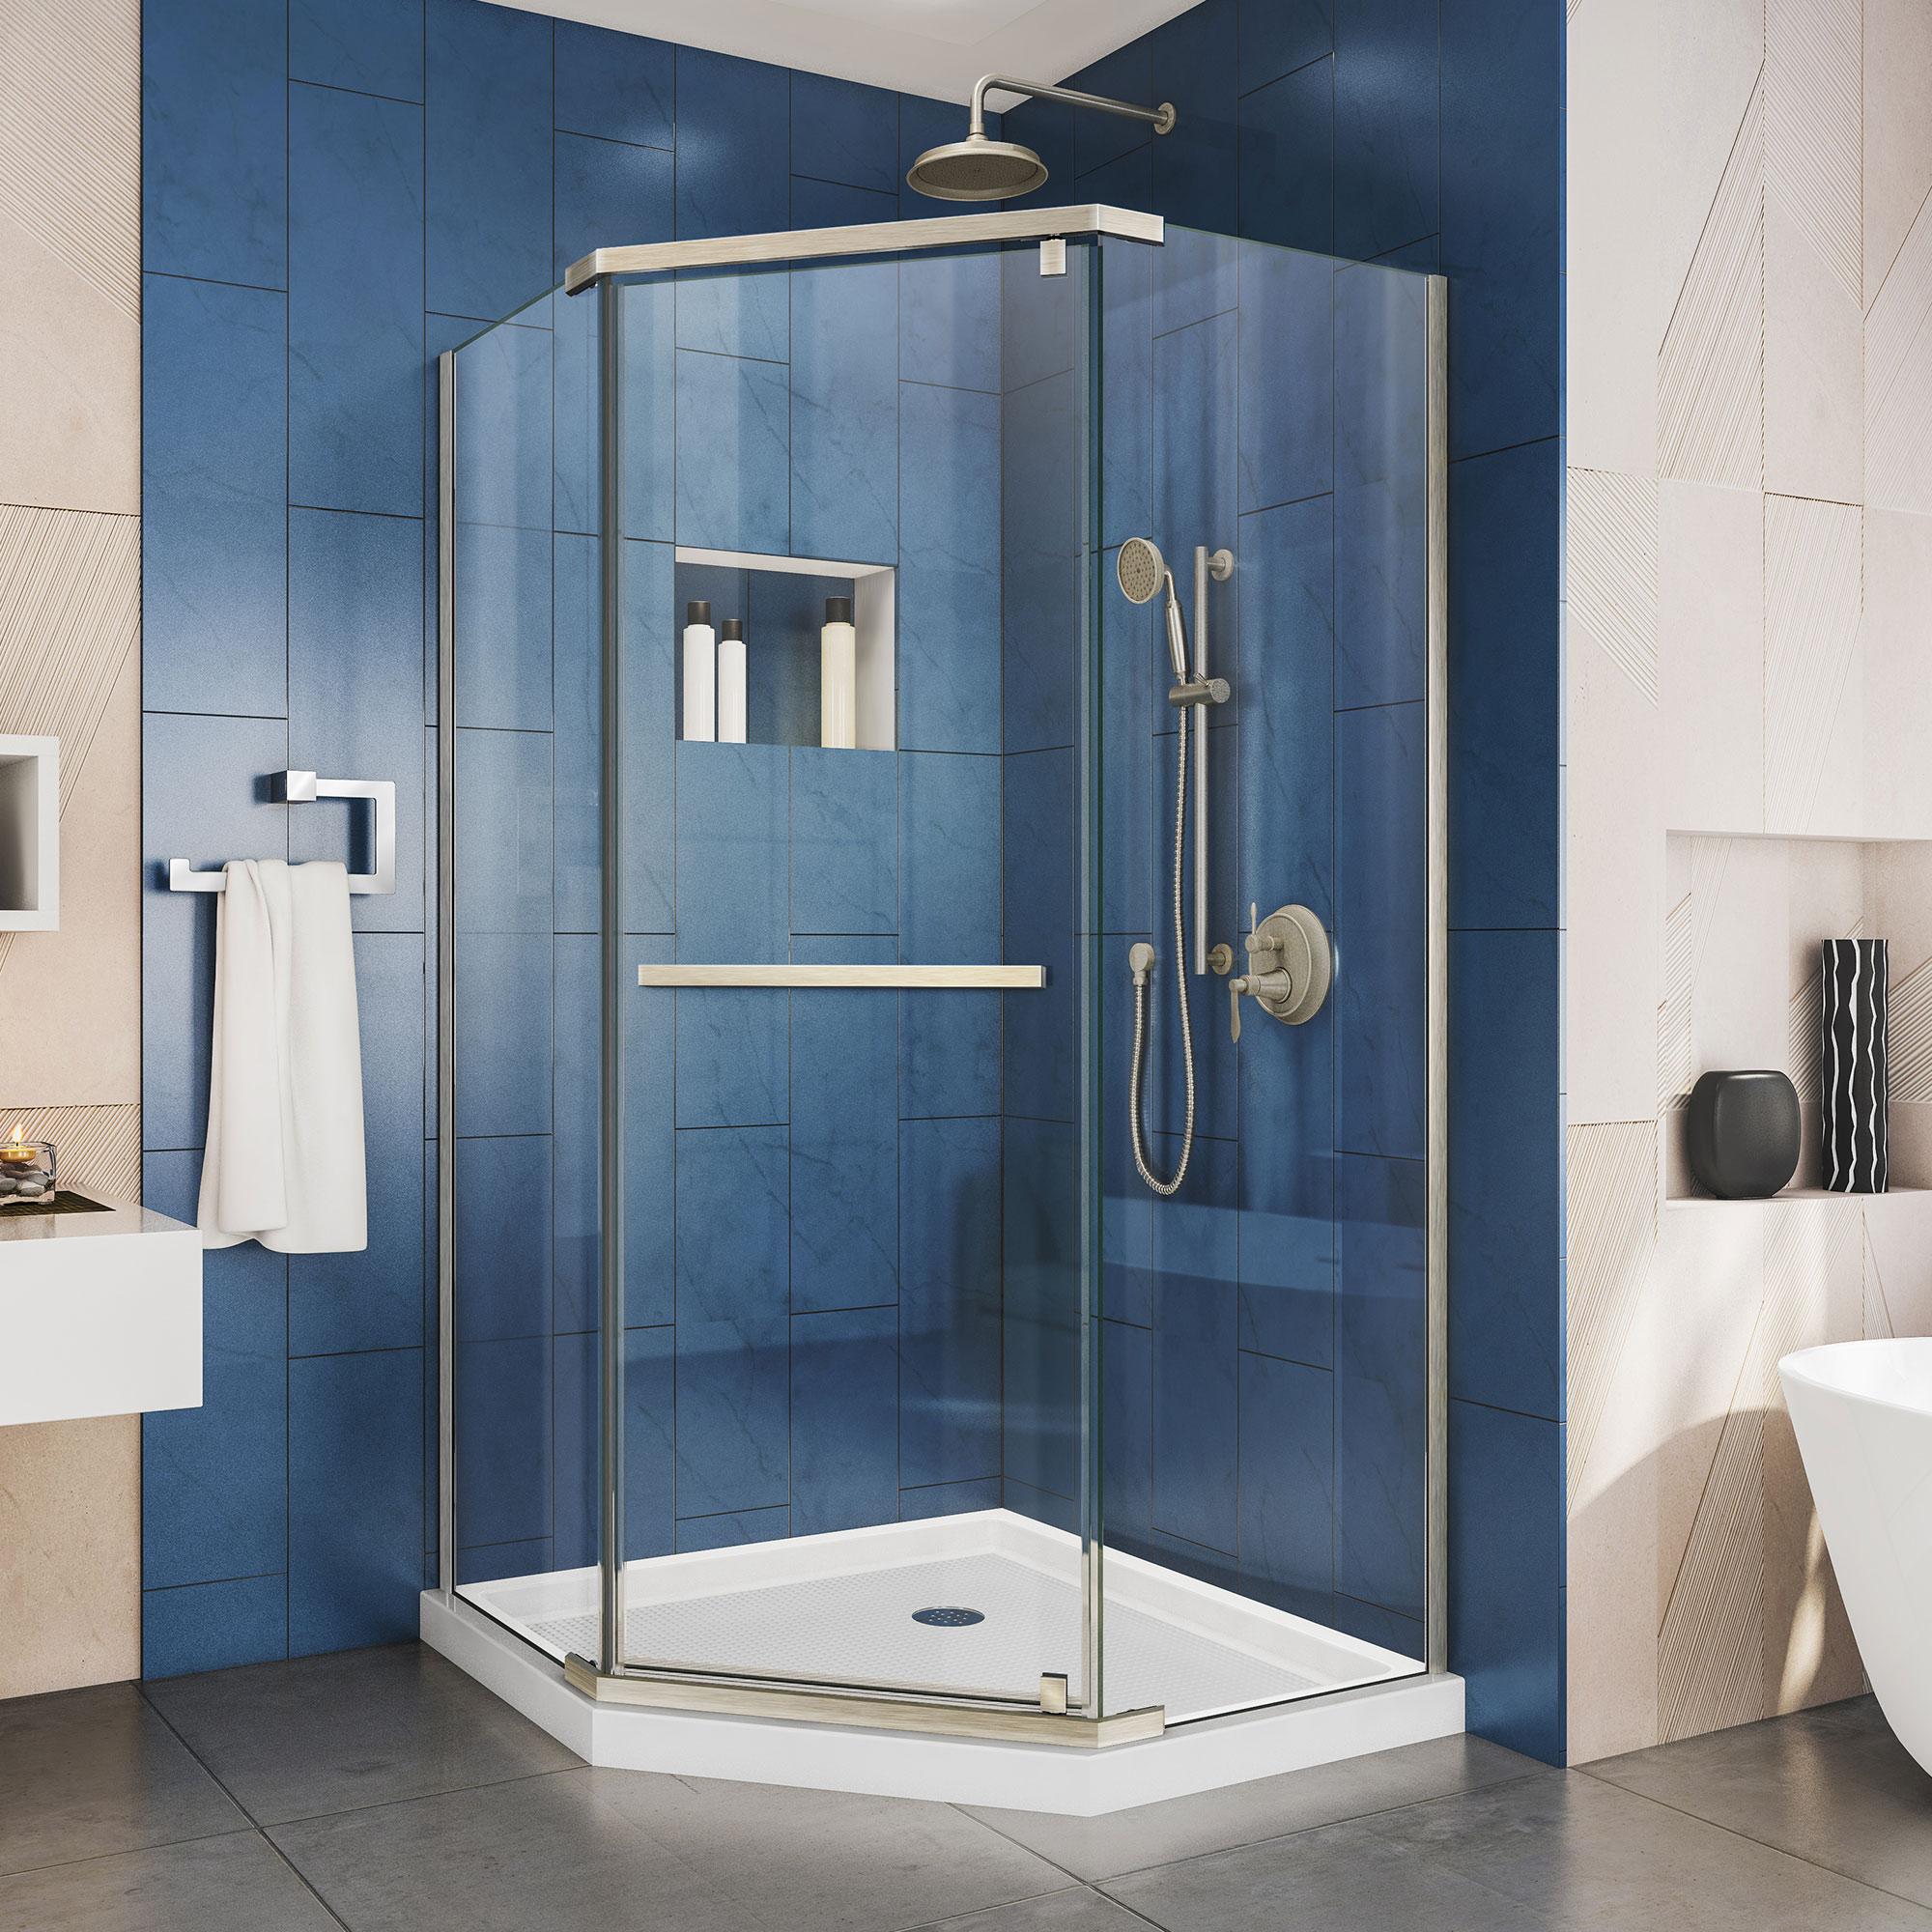 "Prism 36 1/8"" by 36 1/8"" Frameless Pivot Shower Enclosure, Clear 3/8"" Glass Shower, Brushed Nickel"